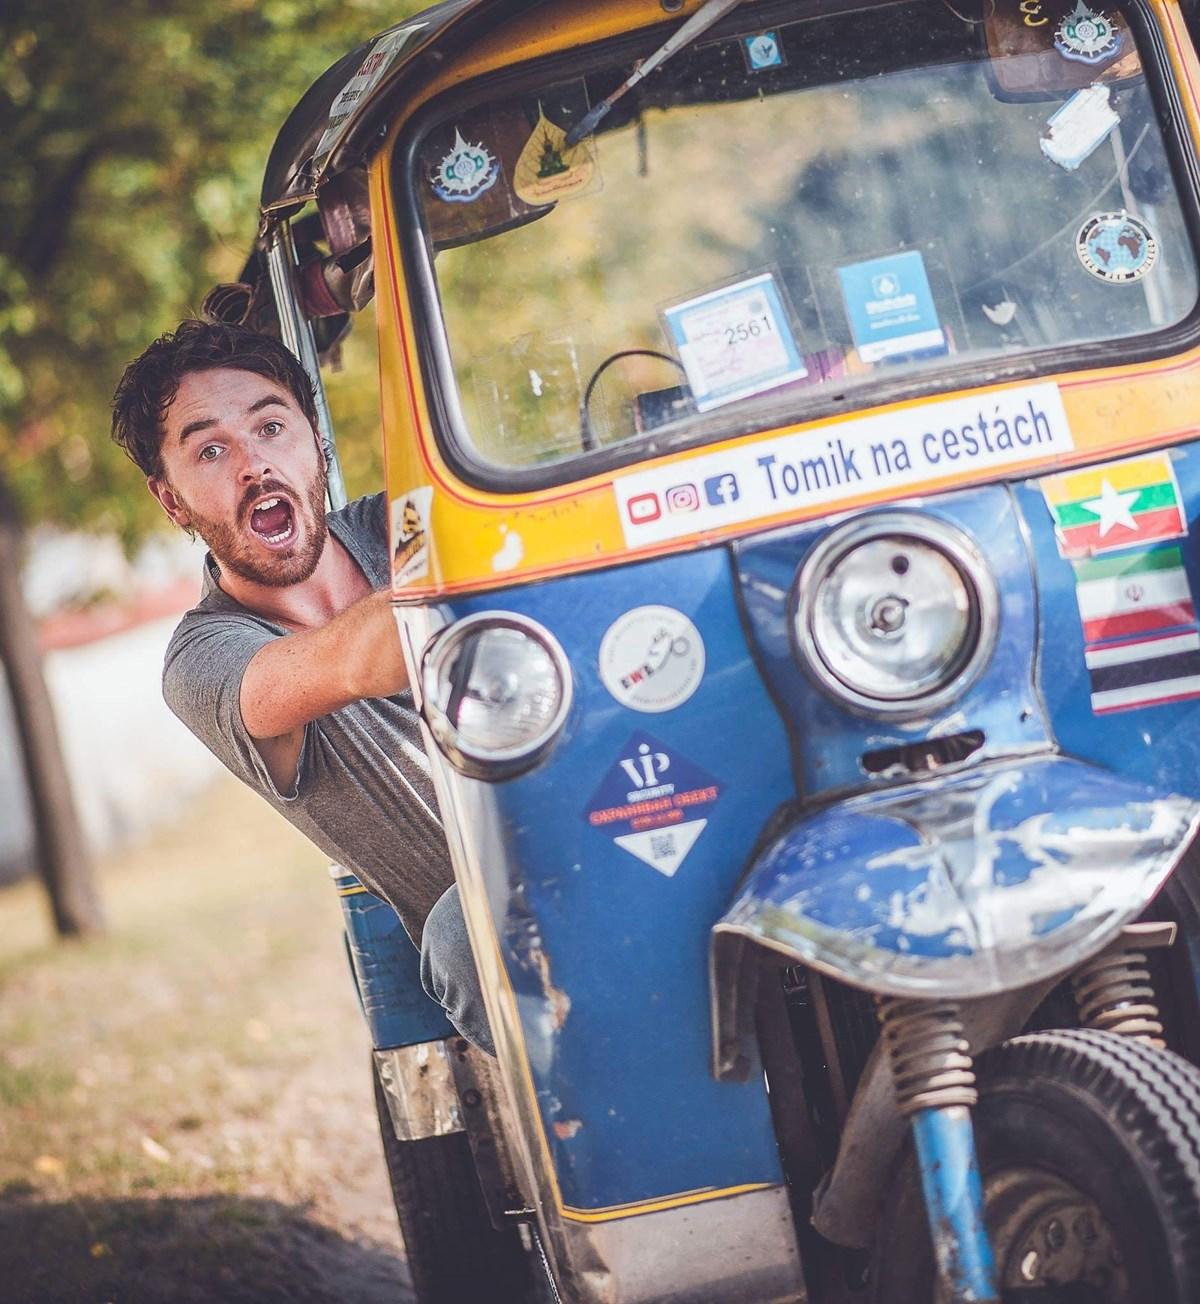 Tuktukem z Thajska až na Moravu s Tomíkem / Hlučín